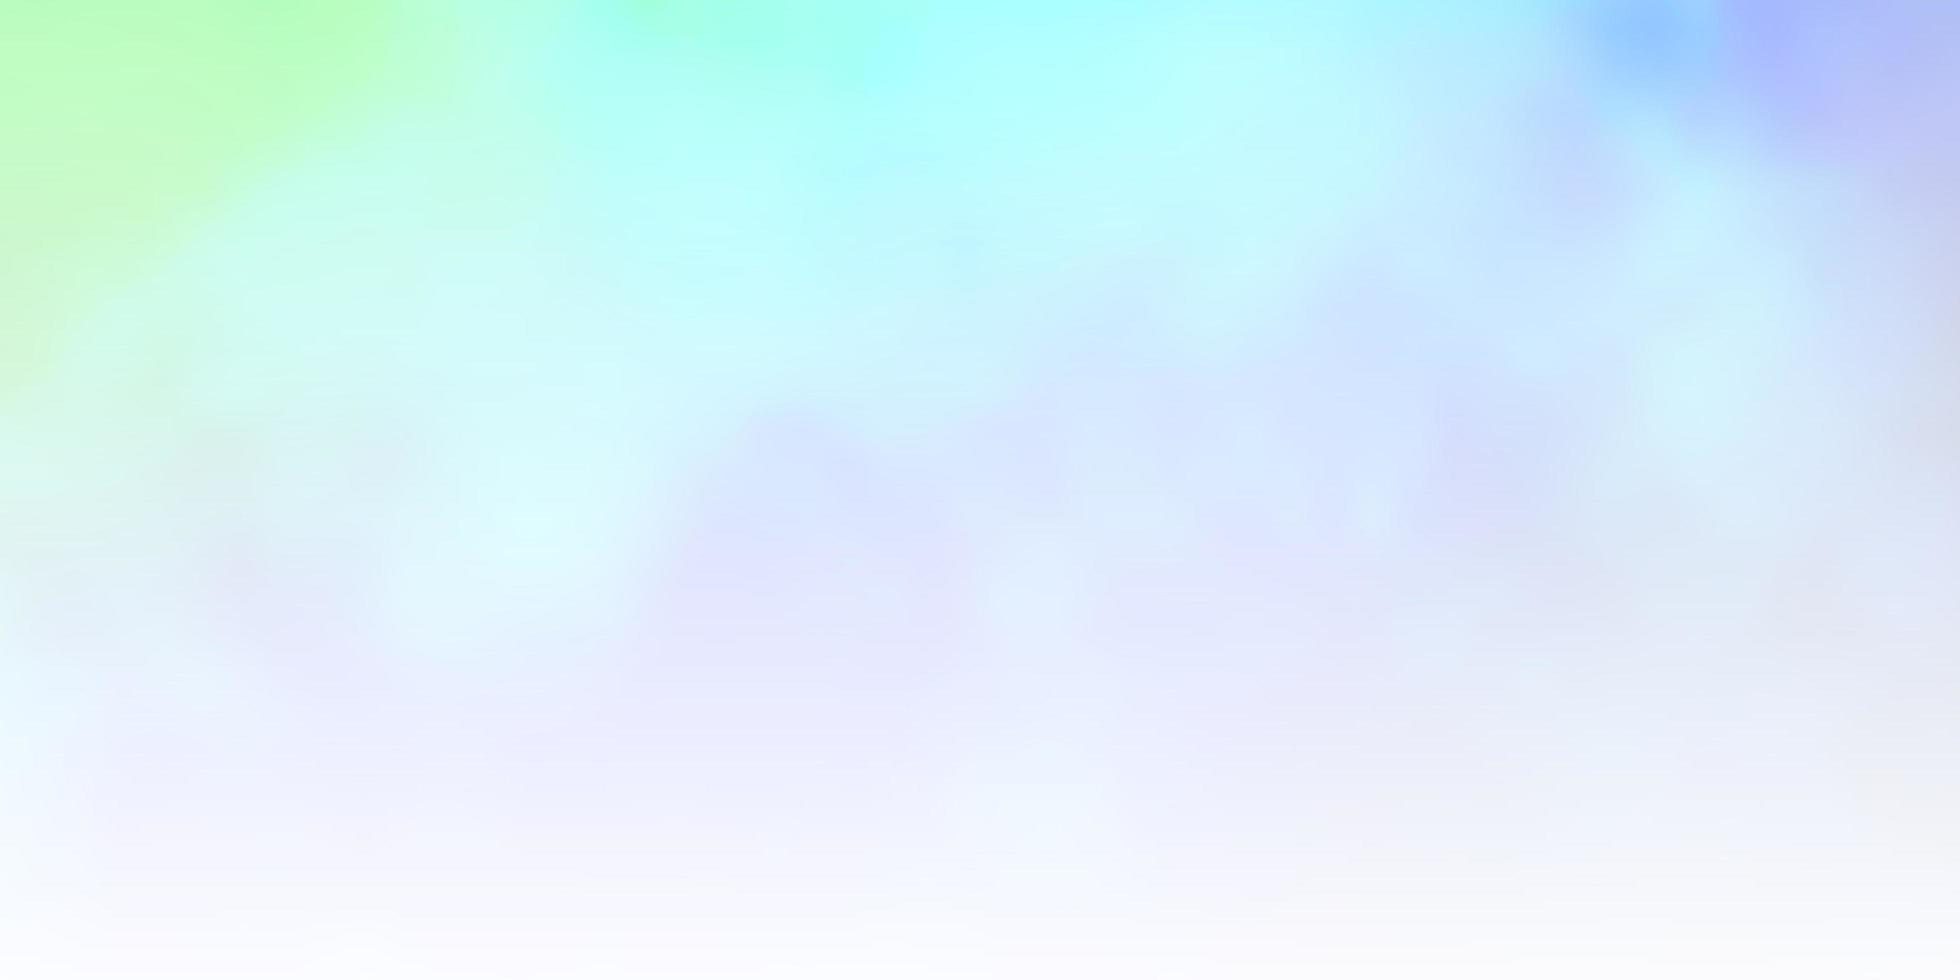 lichtblauwe, groene vectorlay-out met cloudscape. vector